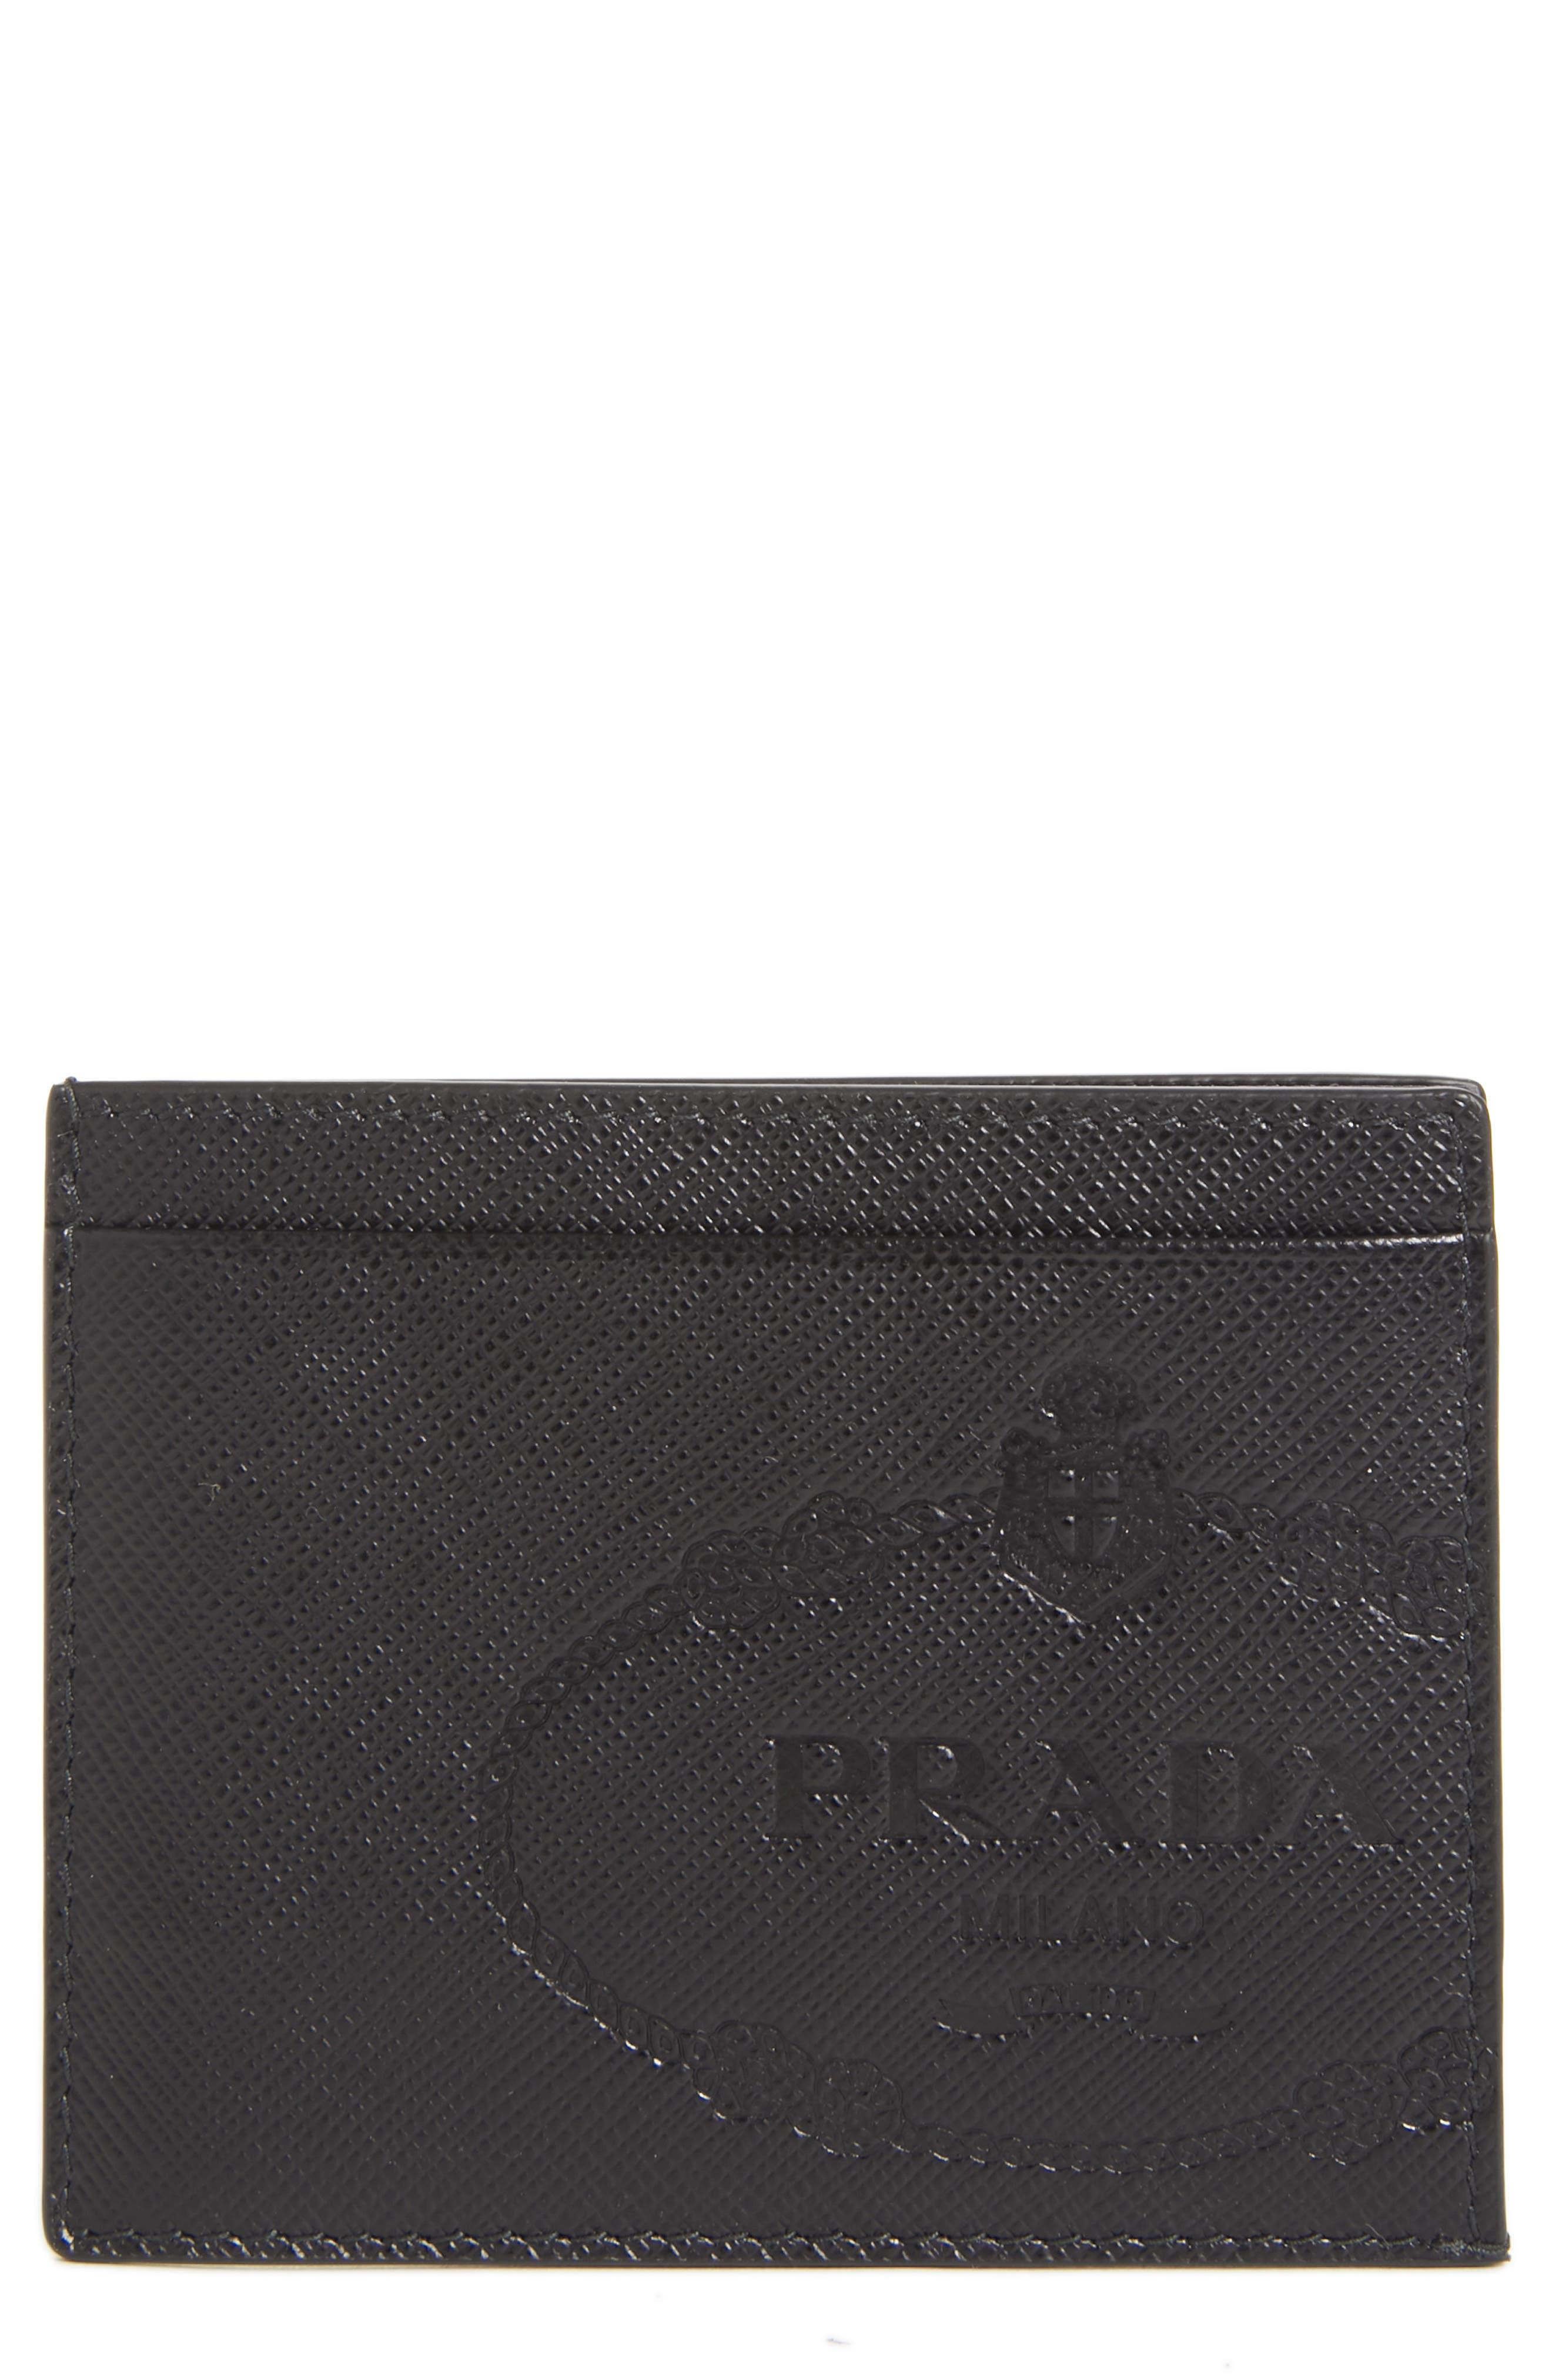 Logo Saffiano Leather Card Case,                         Main,                         color, BLACK